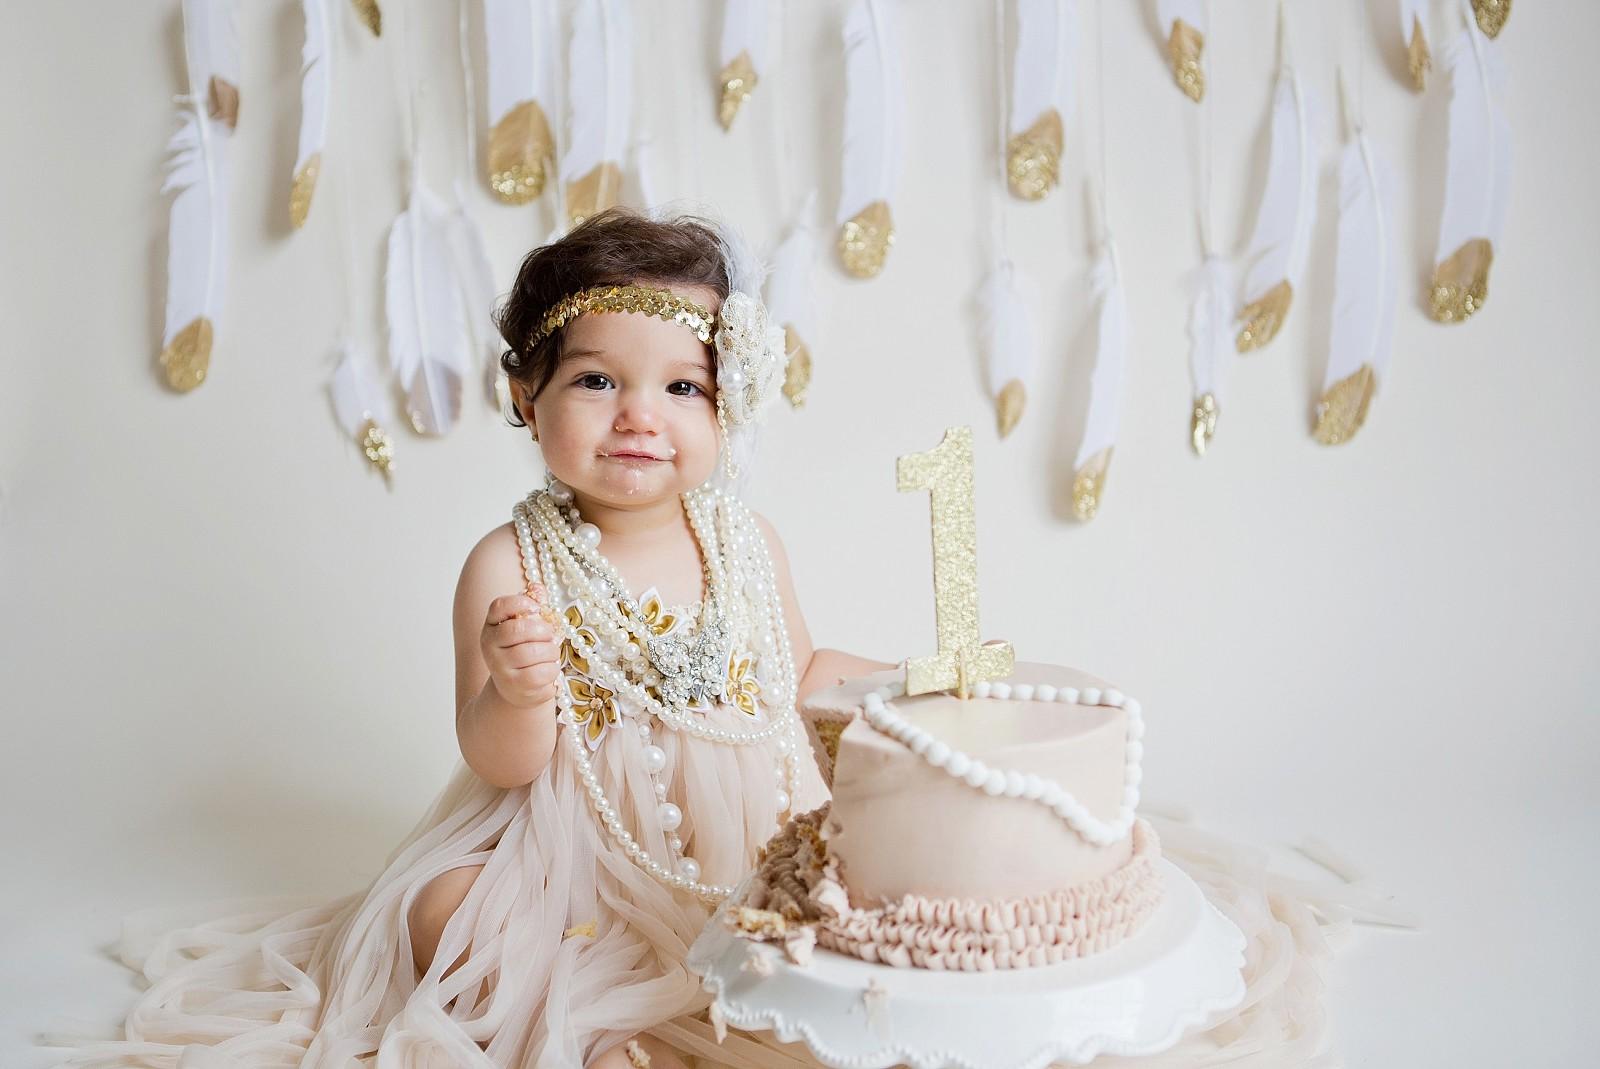 Boca Raton cake smash baby photographer